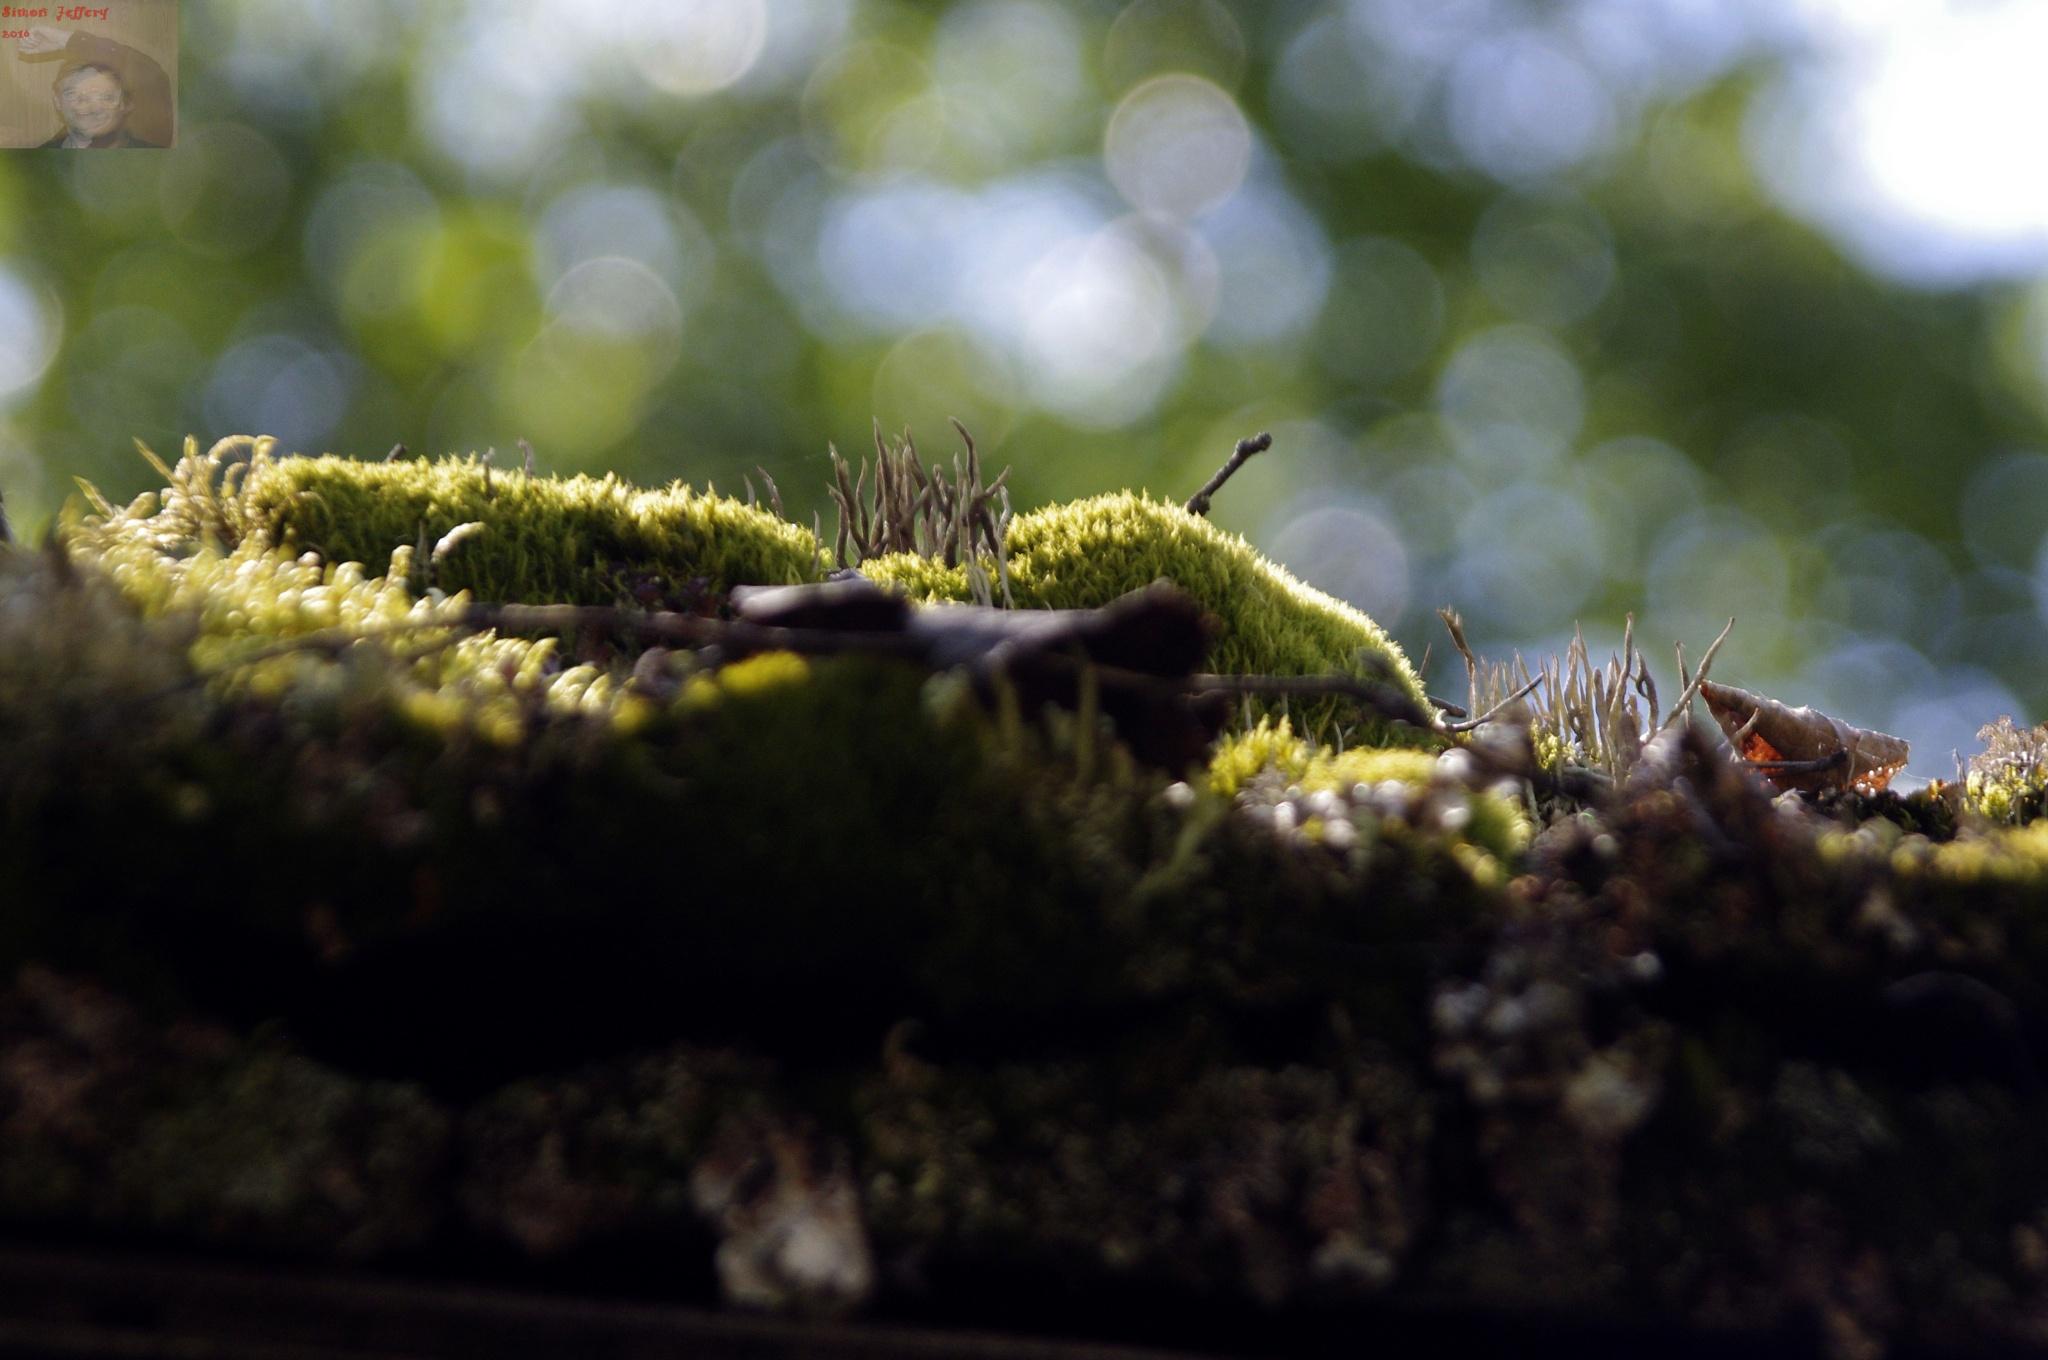 Moss on a roof by Simon Jeffery